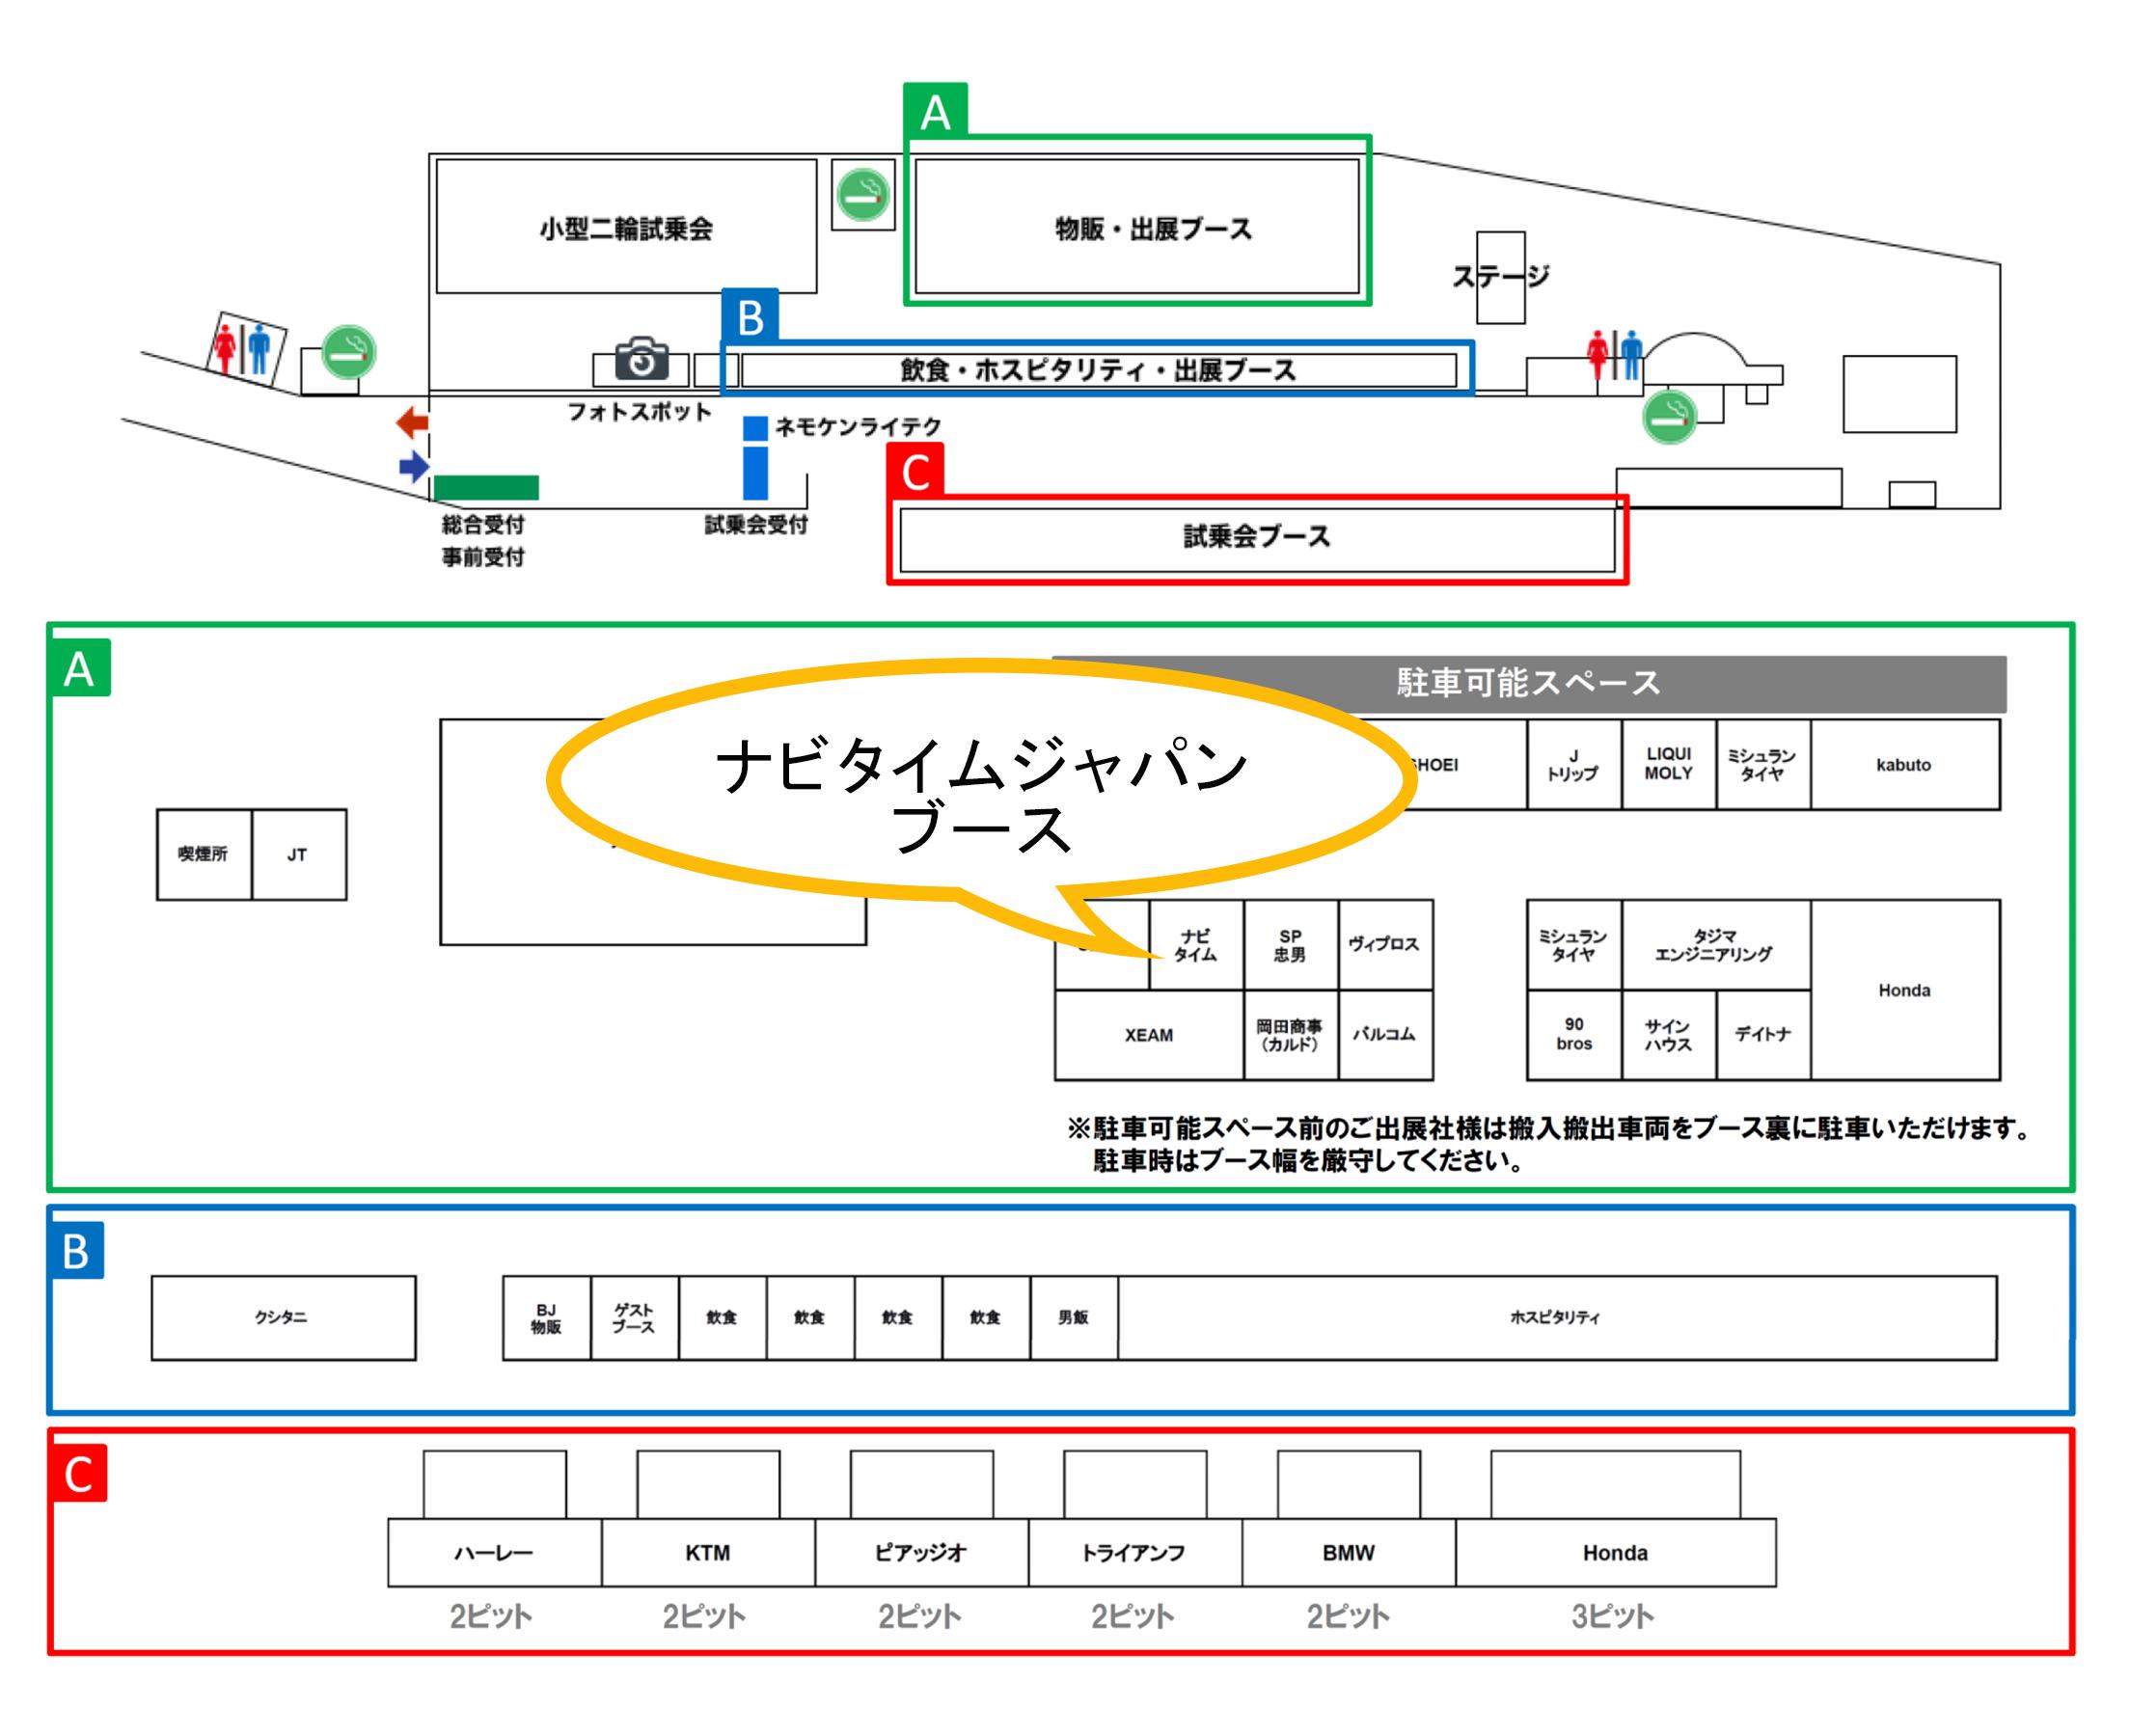 http://corporate.navitime.co.jp/topics/b1cc481ca96067a87a5eadbc259f658589791b7d.png